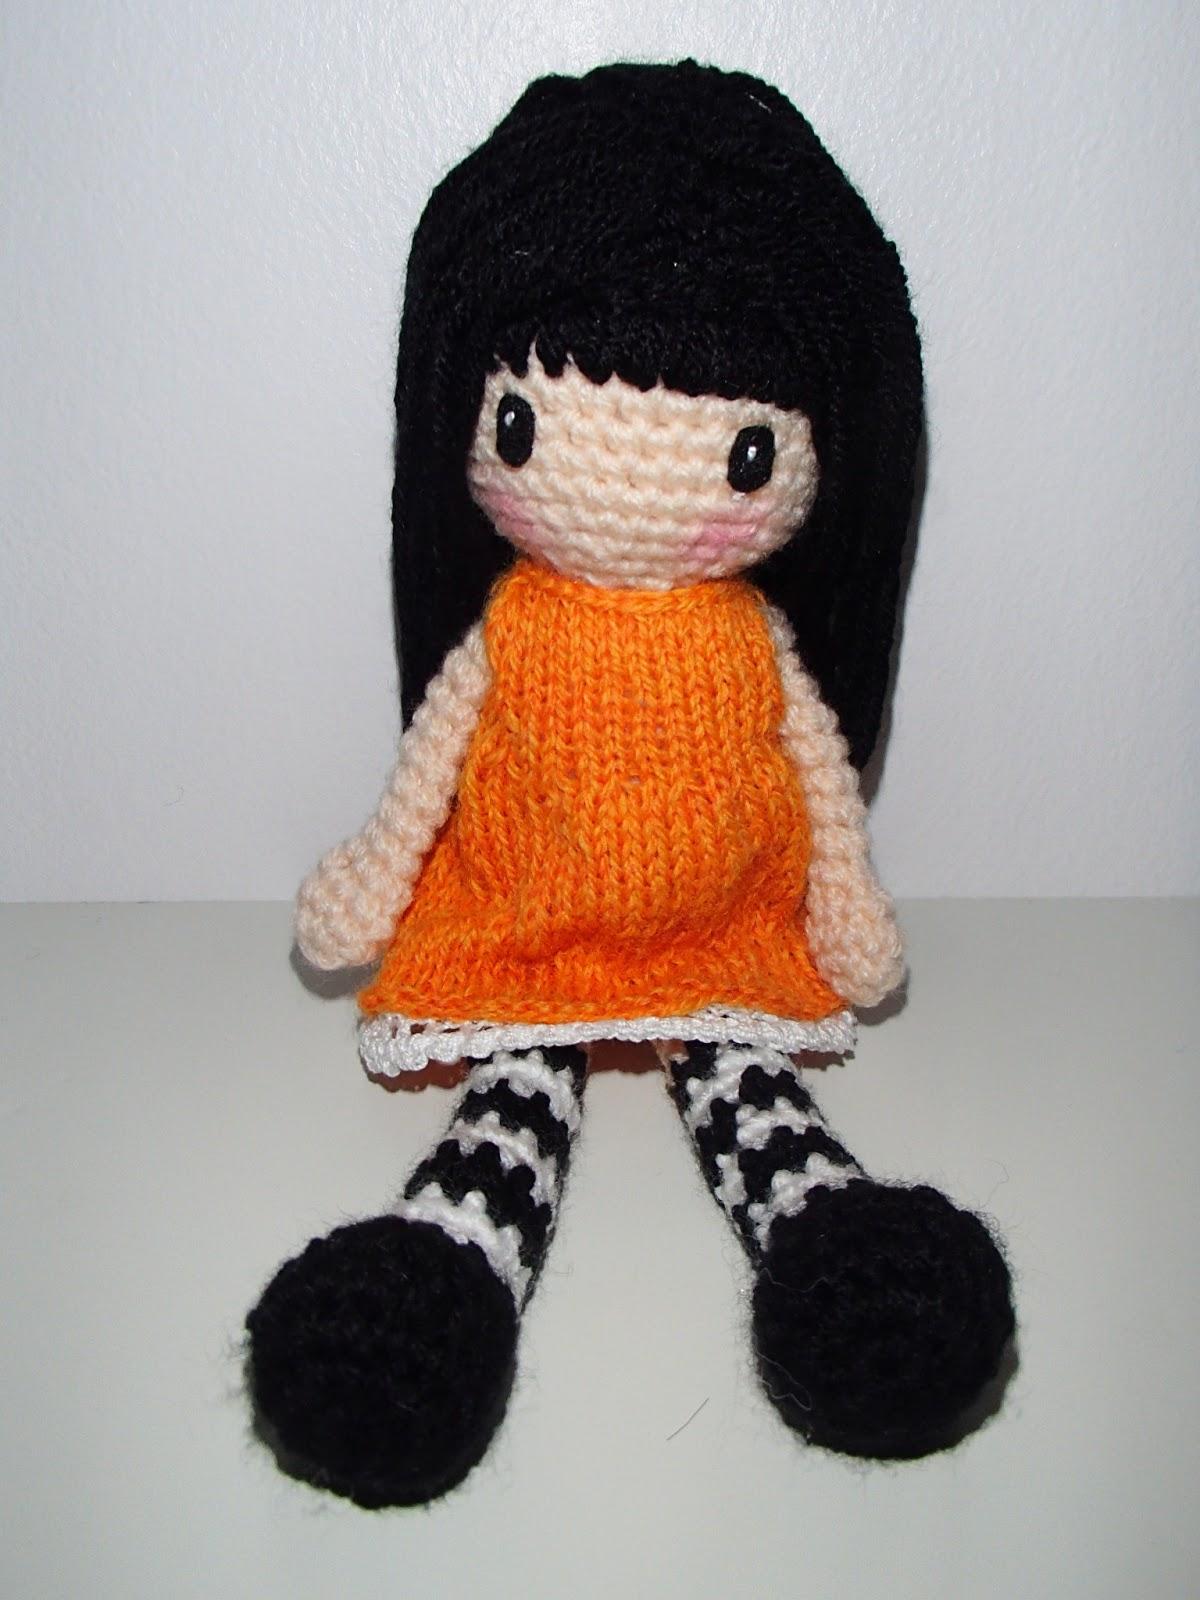 Chiwaluv Amigurumi Critters: Gorjuss Doll Crochet